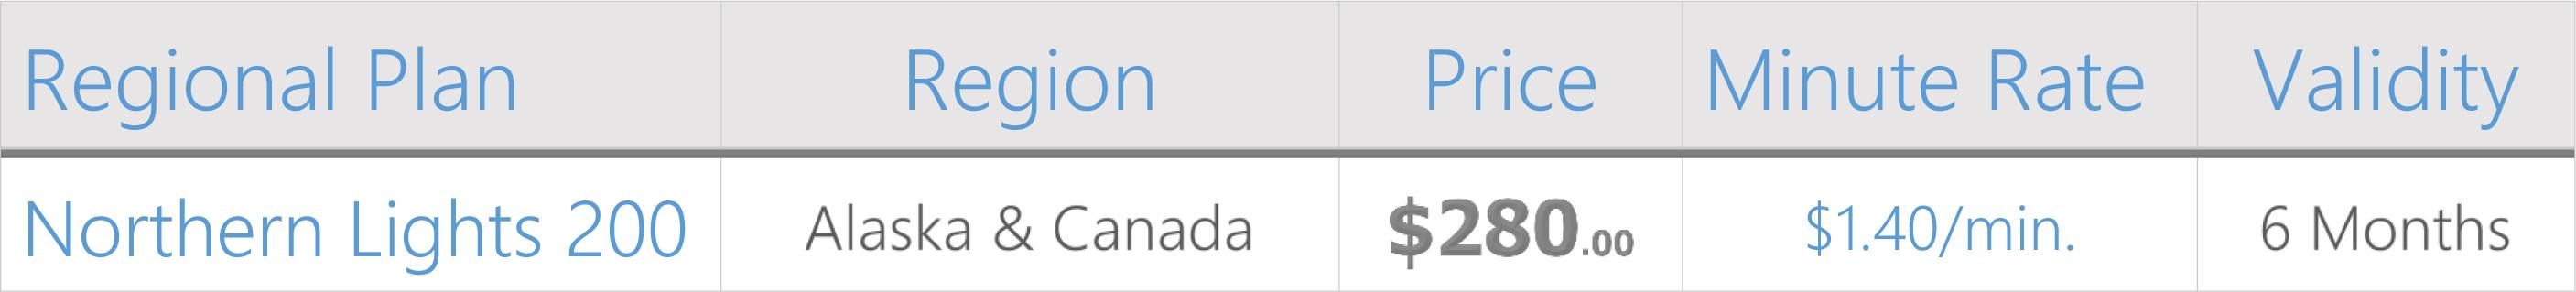 iridium-alaska-canada-regional-prepaid-card-northern-lights-northernaxcess-1.jpg